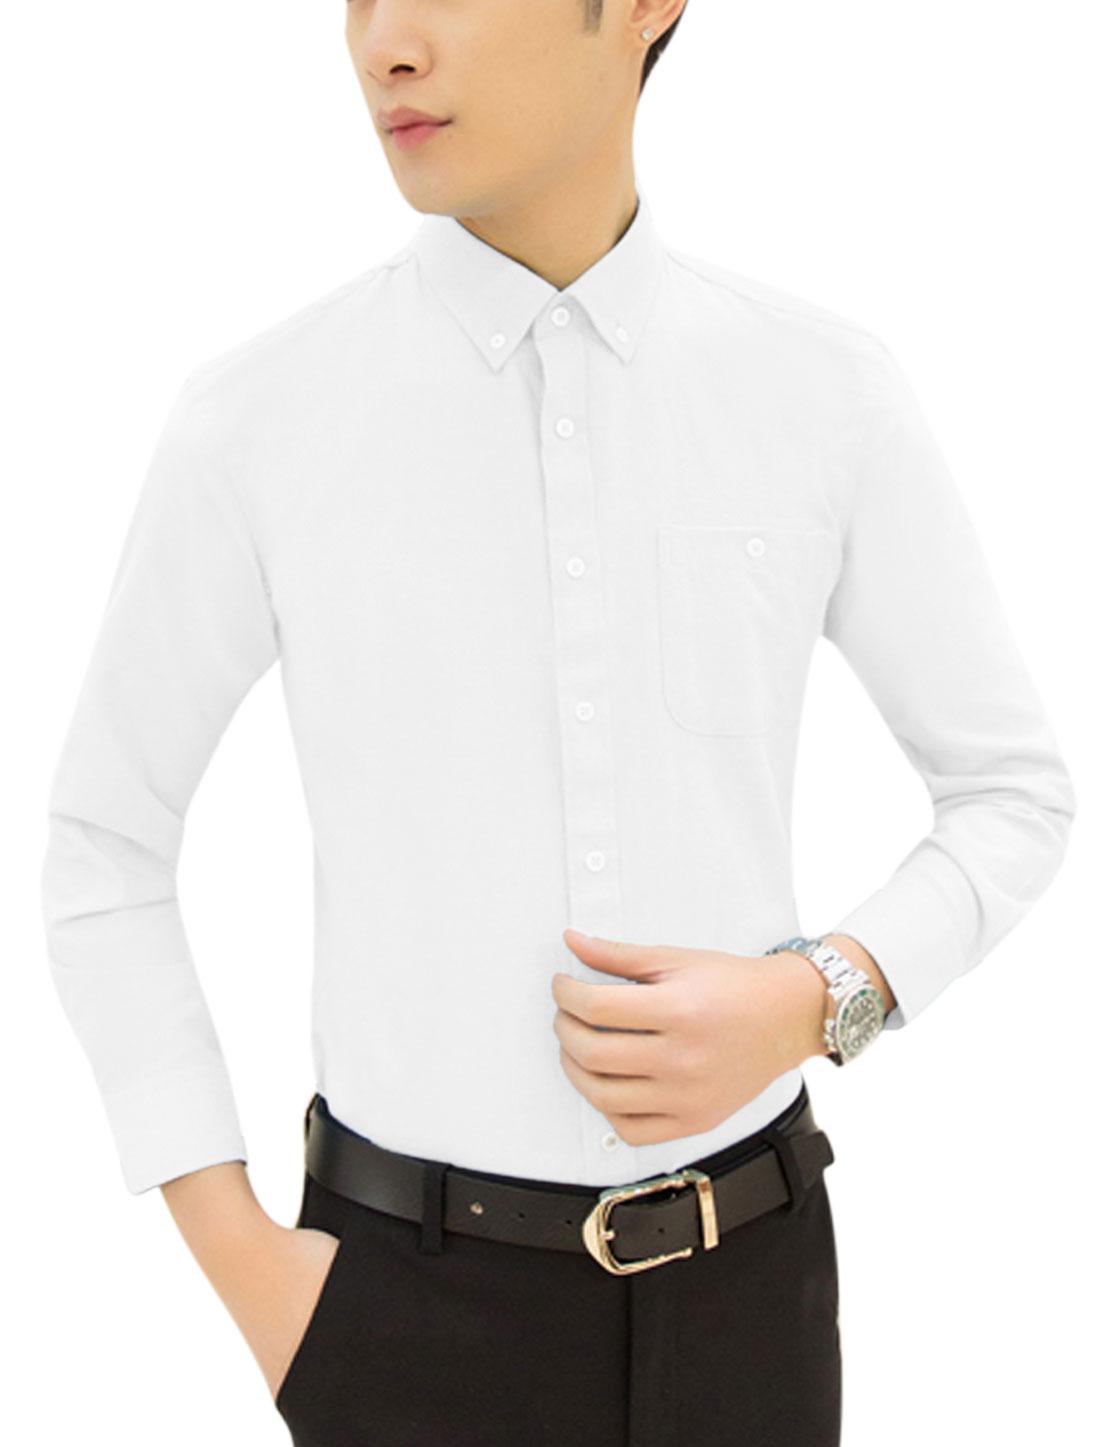 Men Point Collar Pocket Button Down Slim Fit Shirts White M